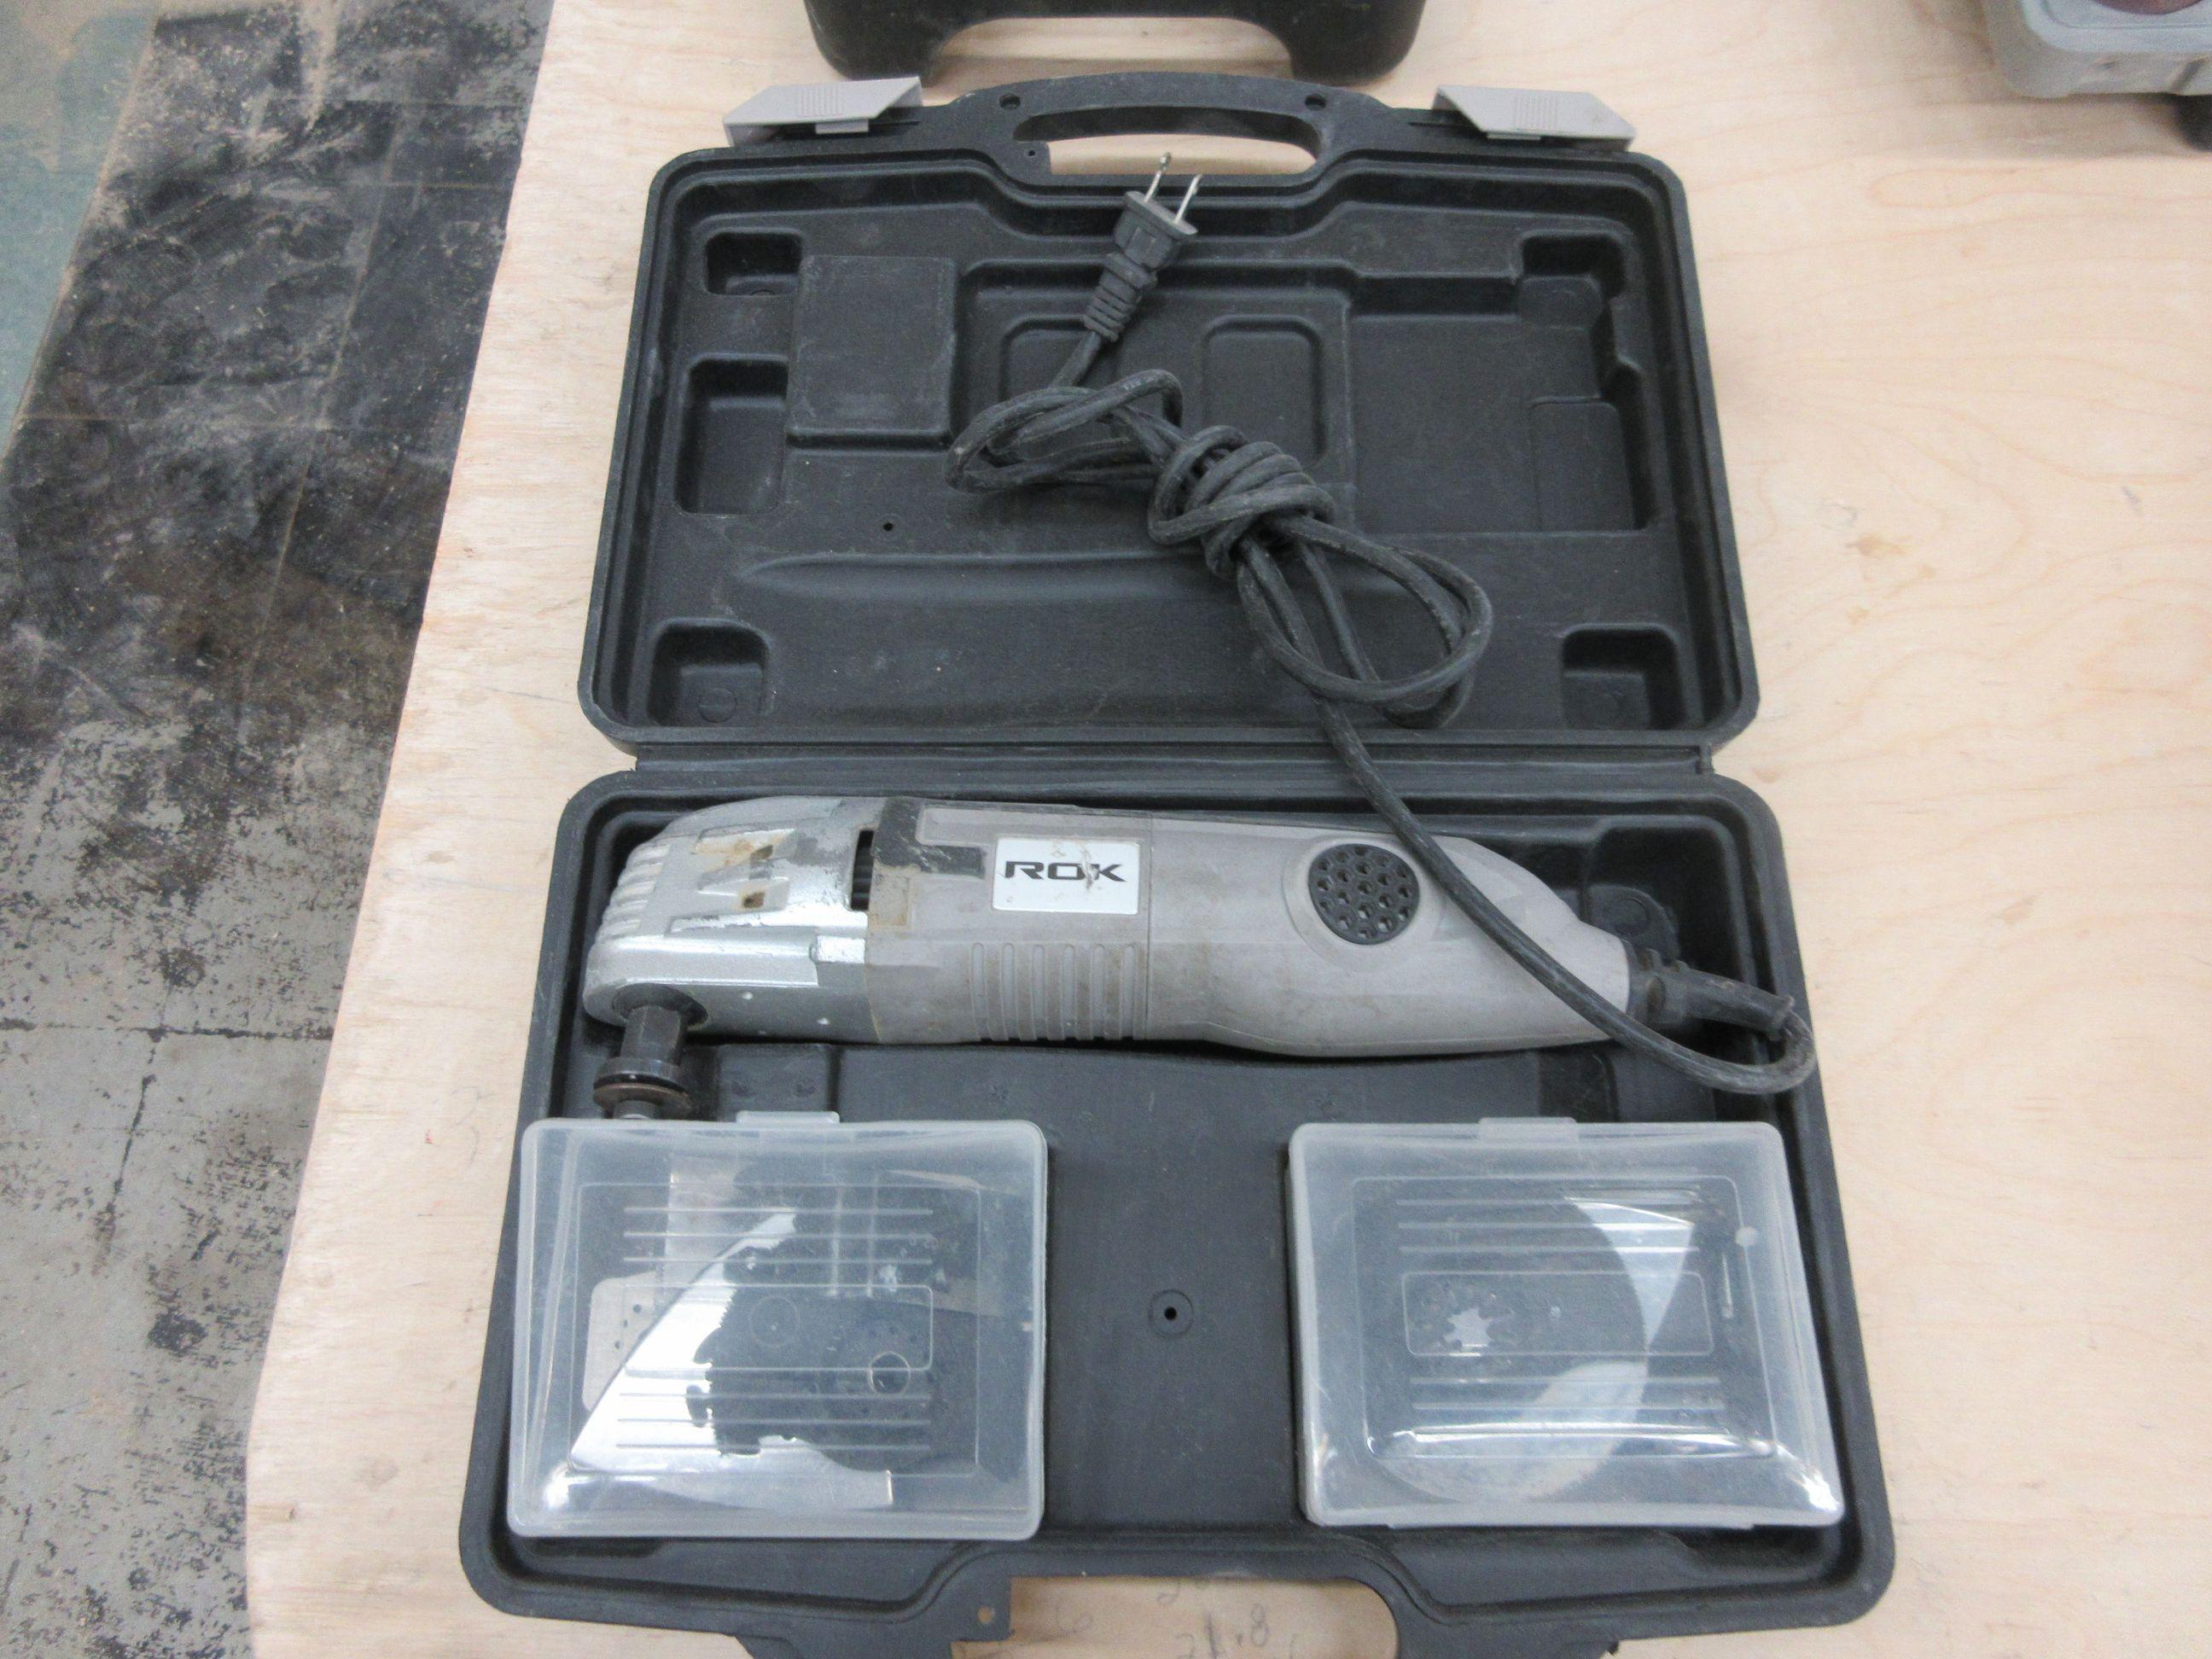 LOT including heater, stapler, etc. - Image 2 of 4